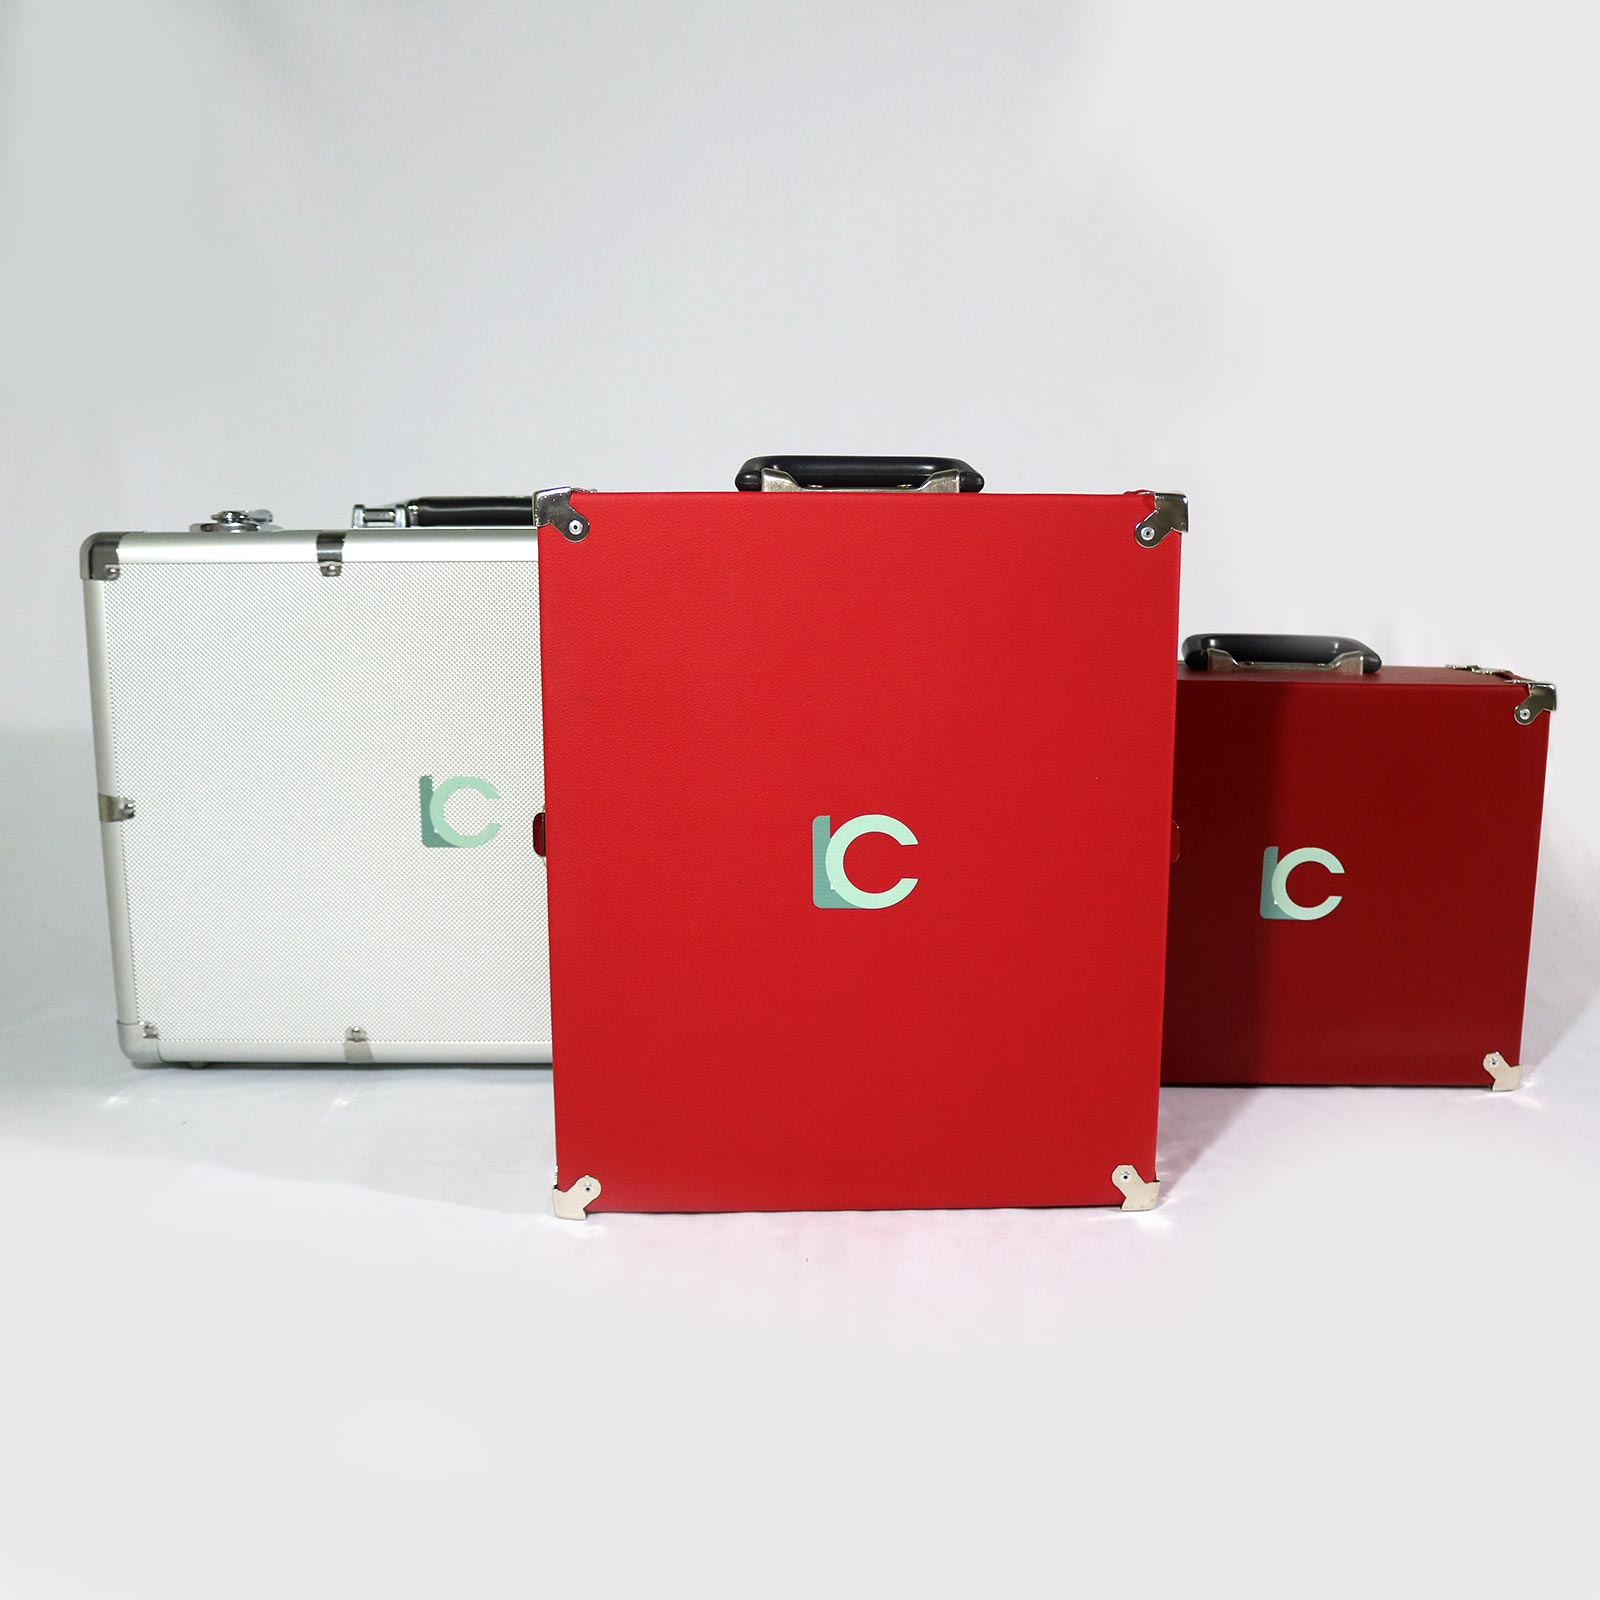 LC Pedalboard kit